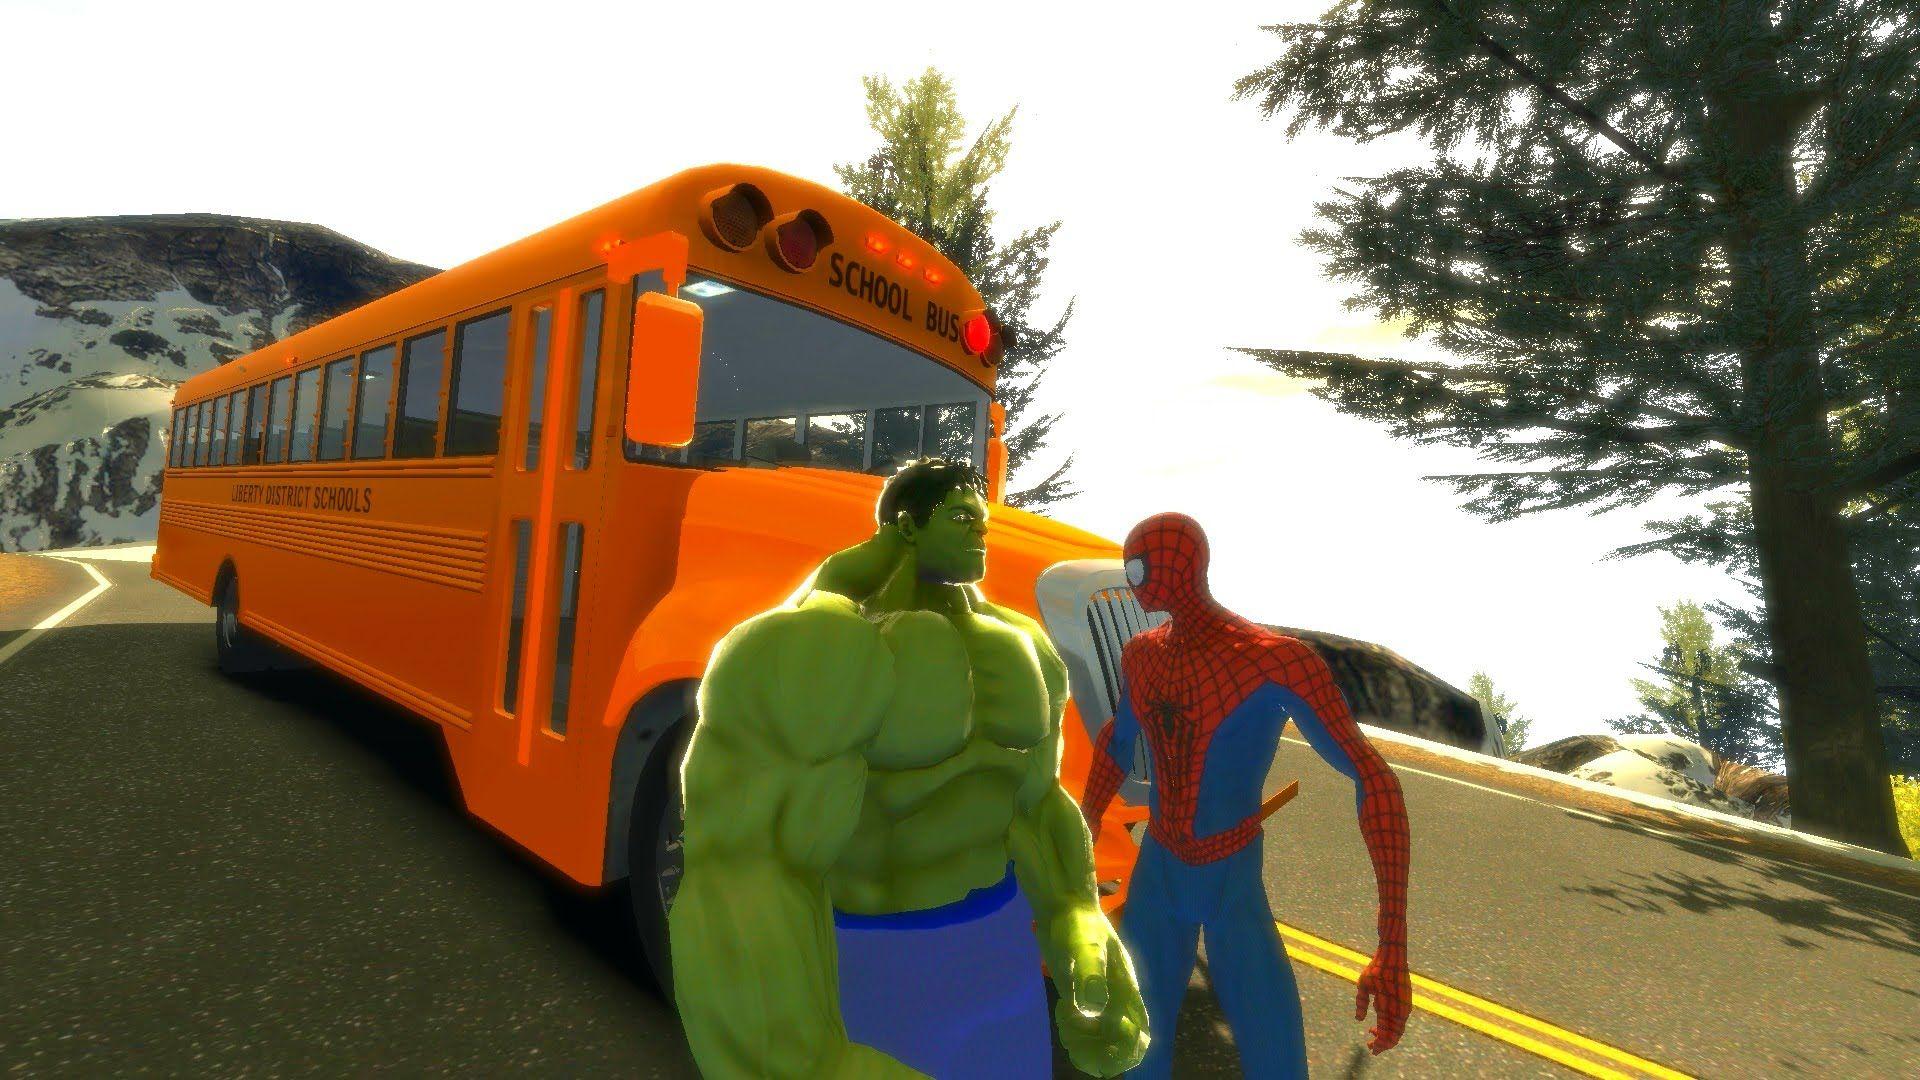 spiderman games spiderman games for kids with nursery rhymes